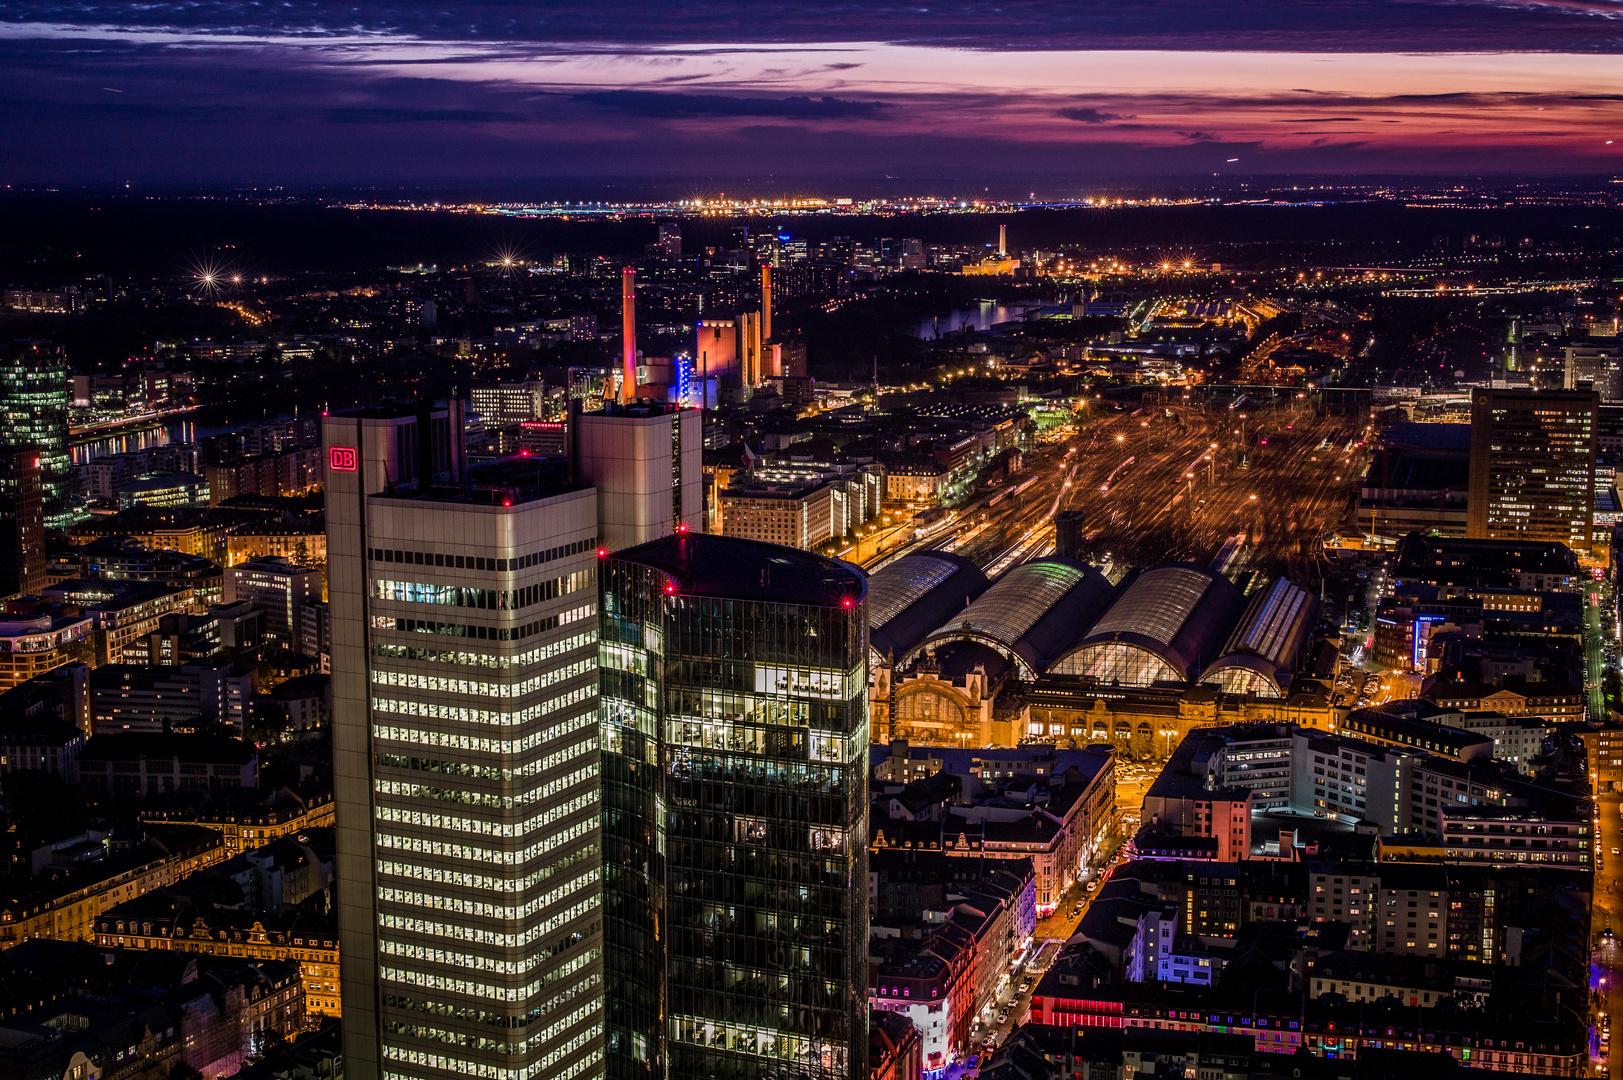 Frankfurt by Night (VI)